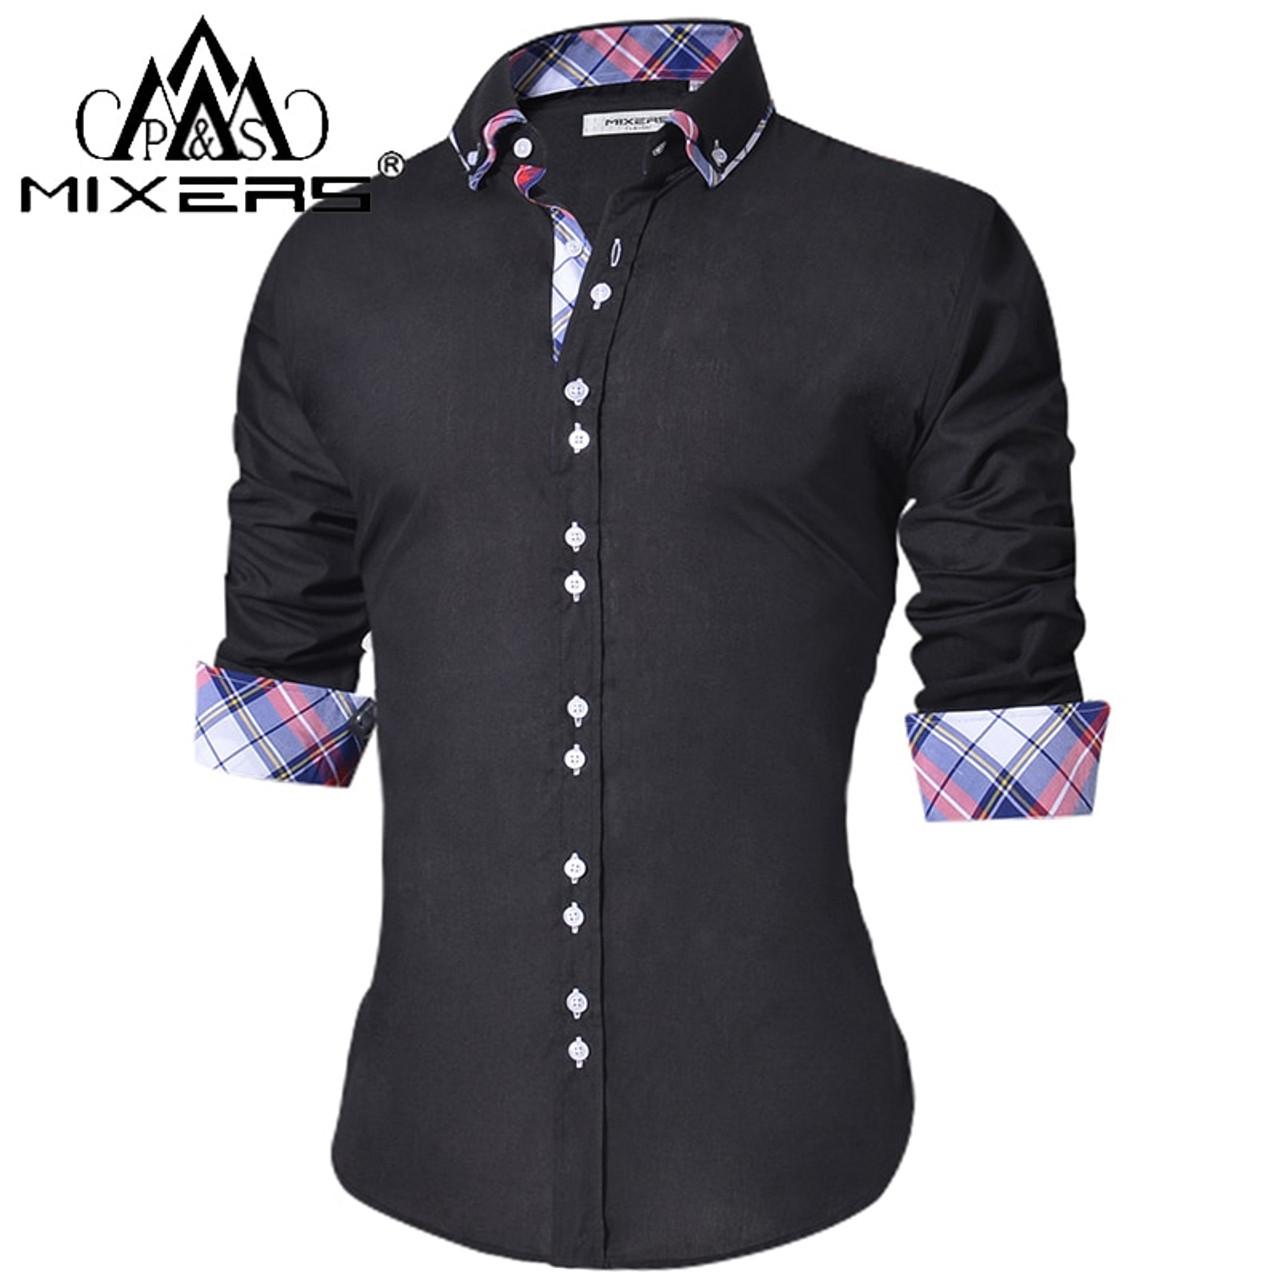 46985ff5f522 2018 Men s Casual Shirt Slim Fit Men s Casual Button Down Shirt Long Sleeve  Formal Dress Shirts ...